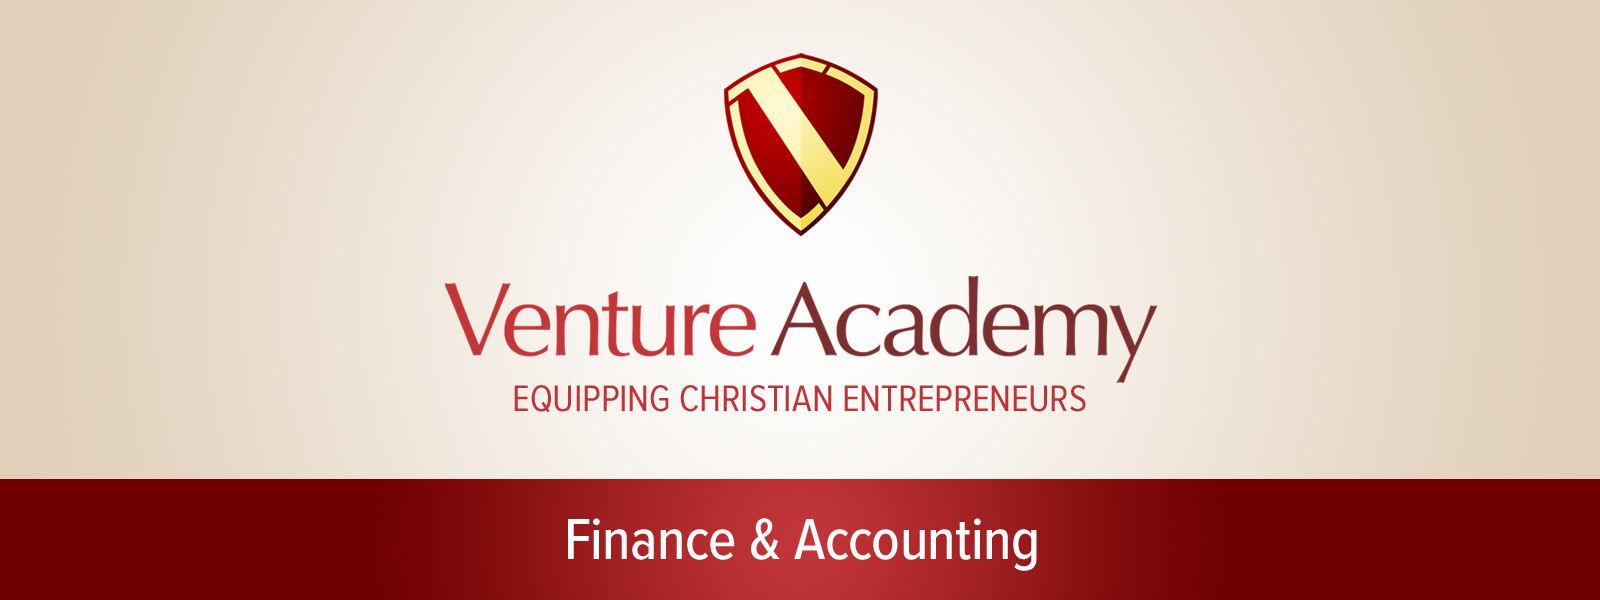 3) Finance & Accounting